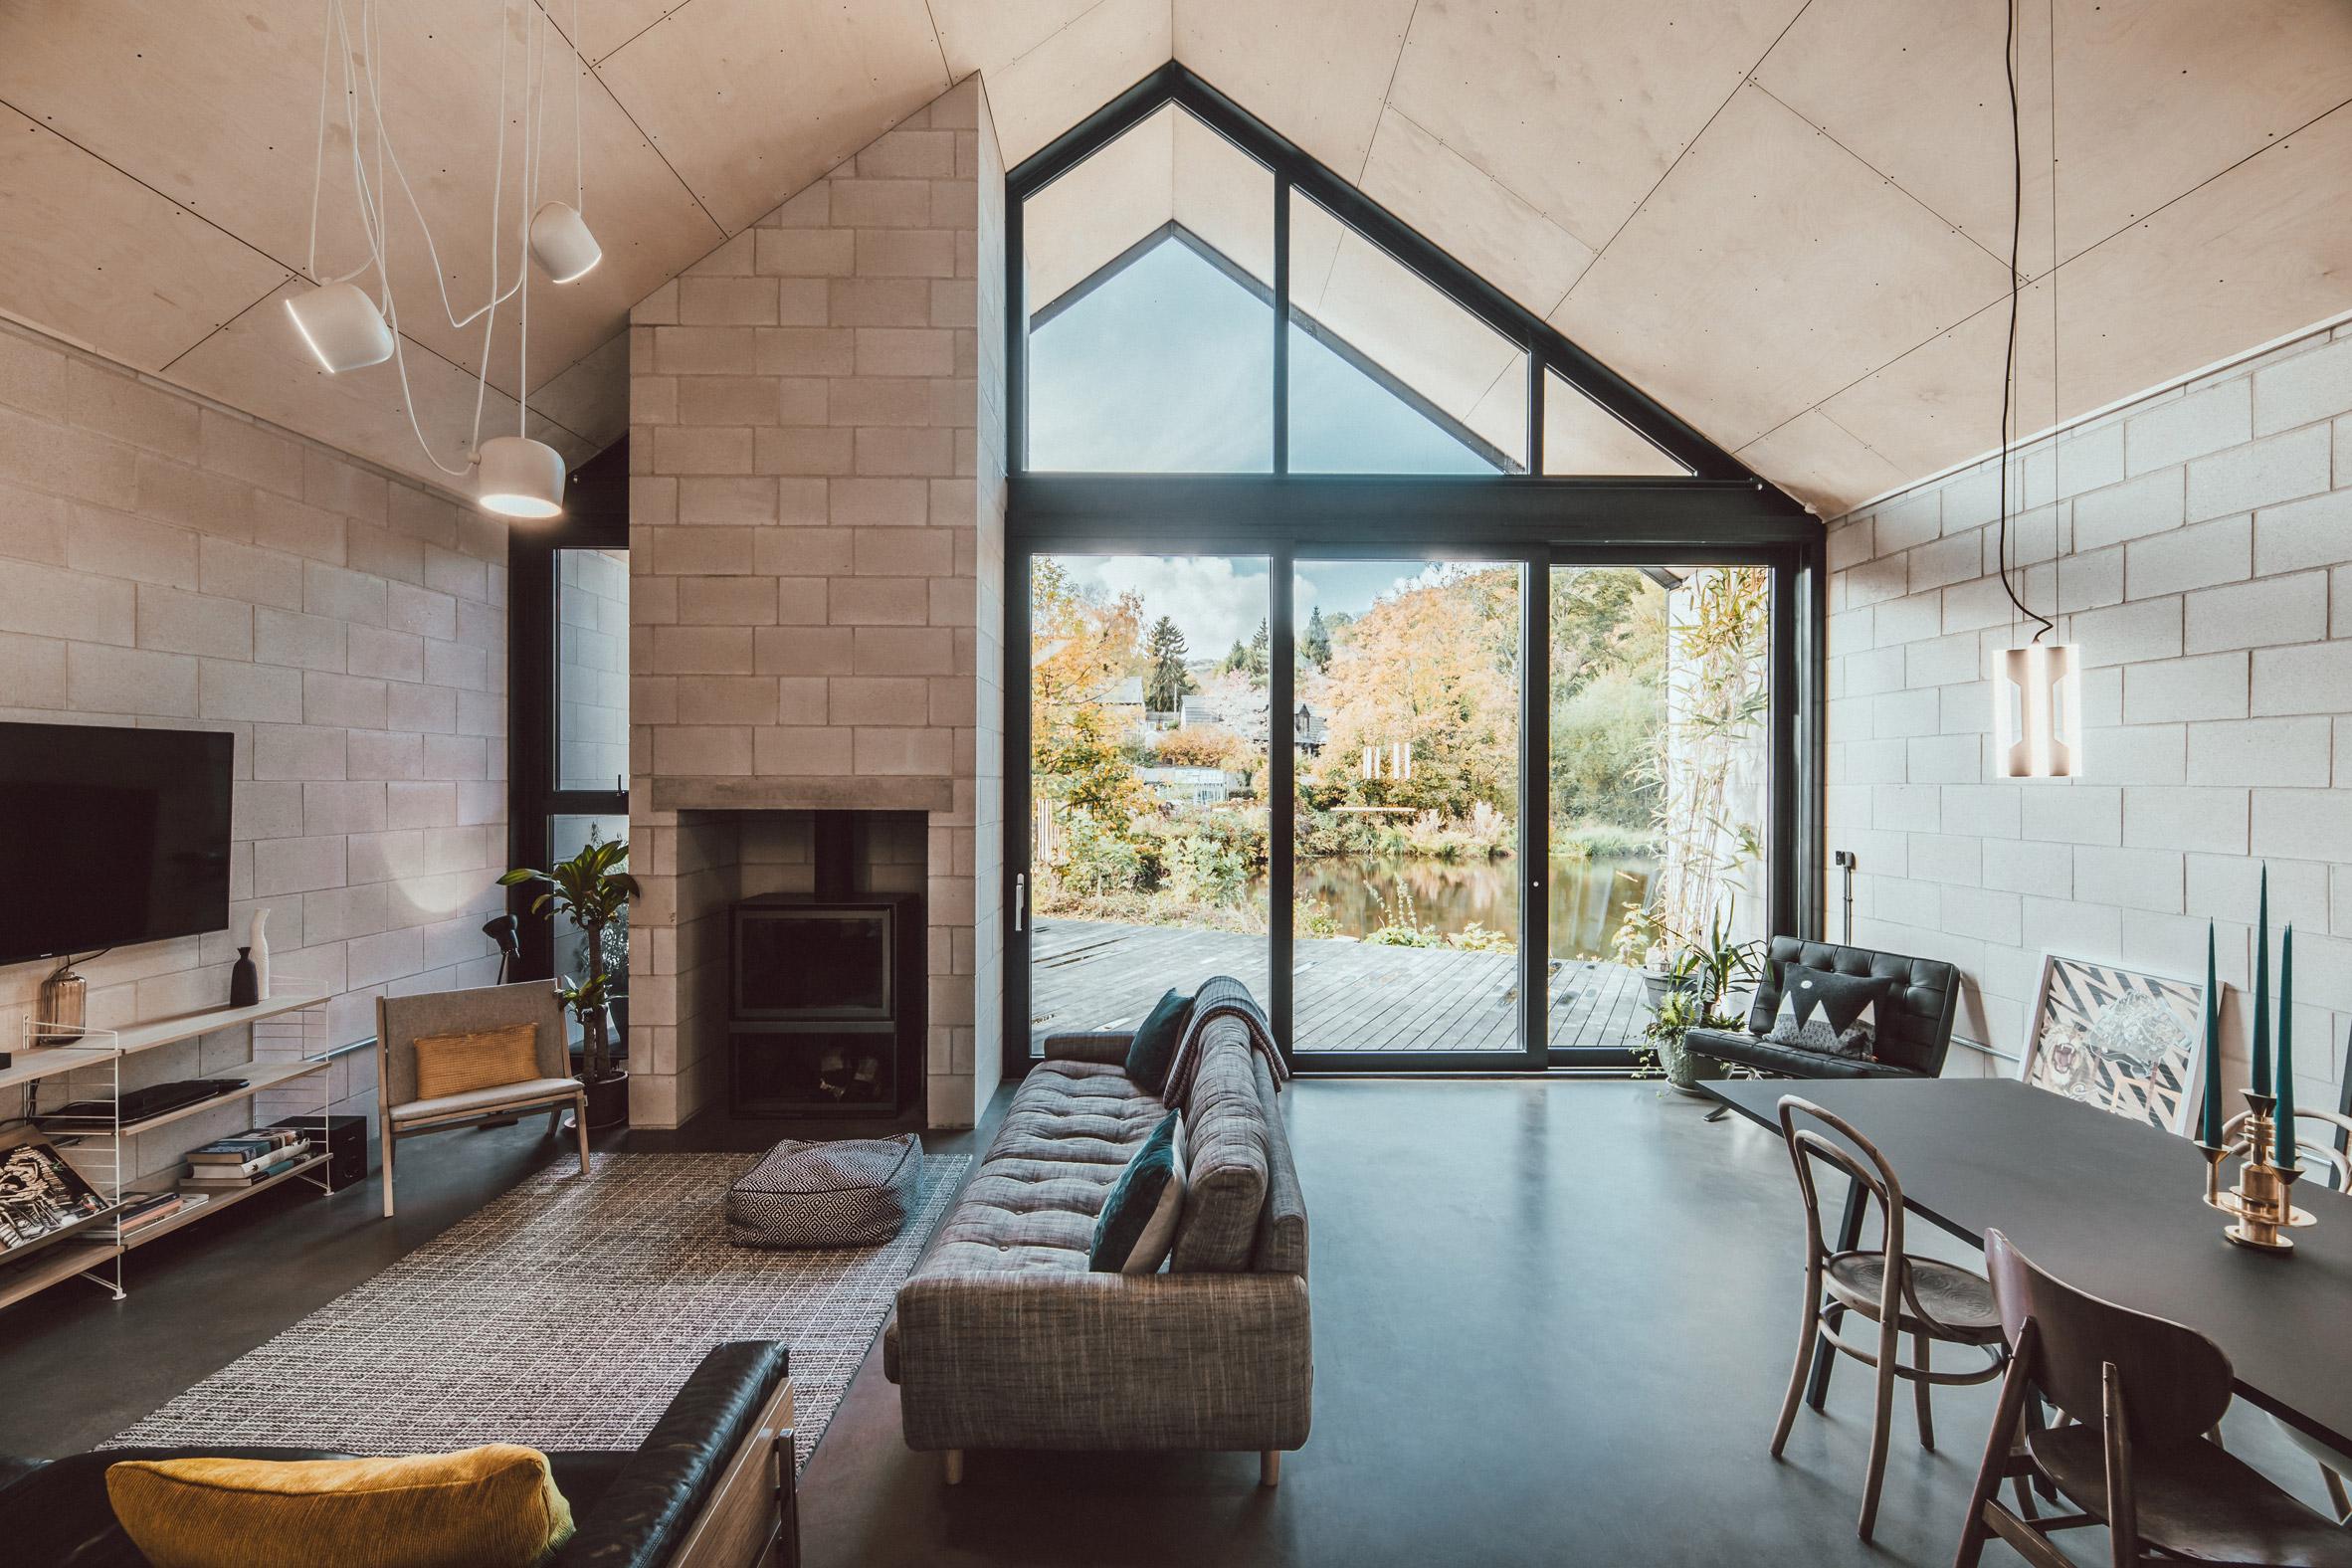 twin-build-nik-jon-draughty-coda-architectur-residential-bespoke-black-metal-house-sheffield-uk-_dezeen_2364_col_2.jpg